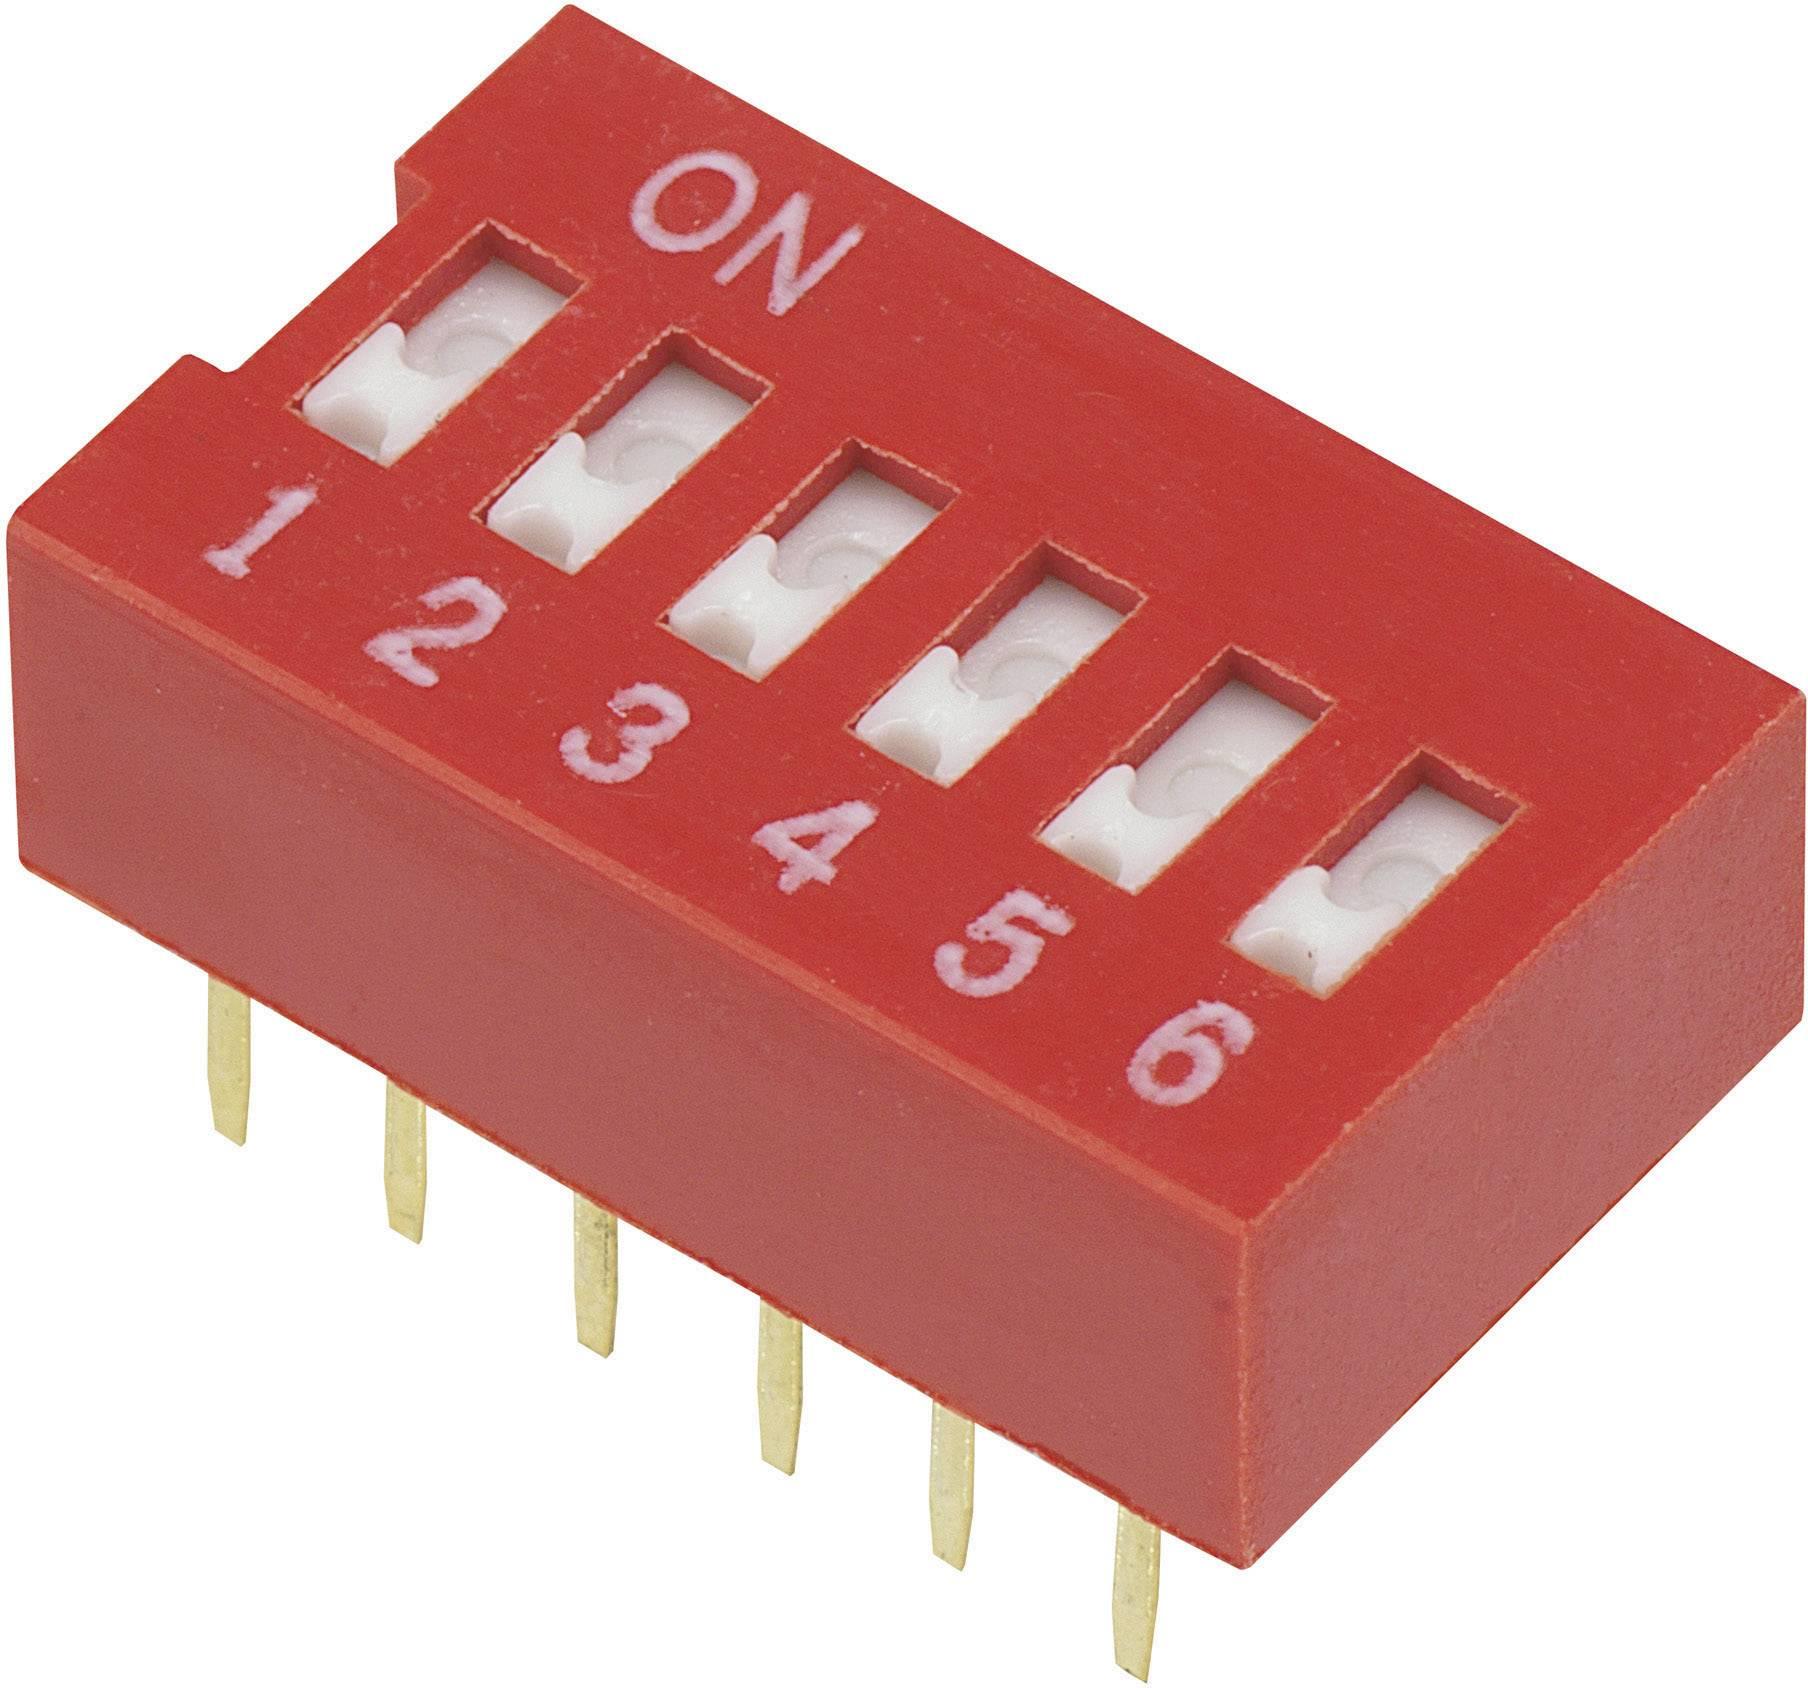 DIP spínač DSR-06, (š x v) 9,9 mm x 5,7 mm